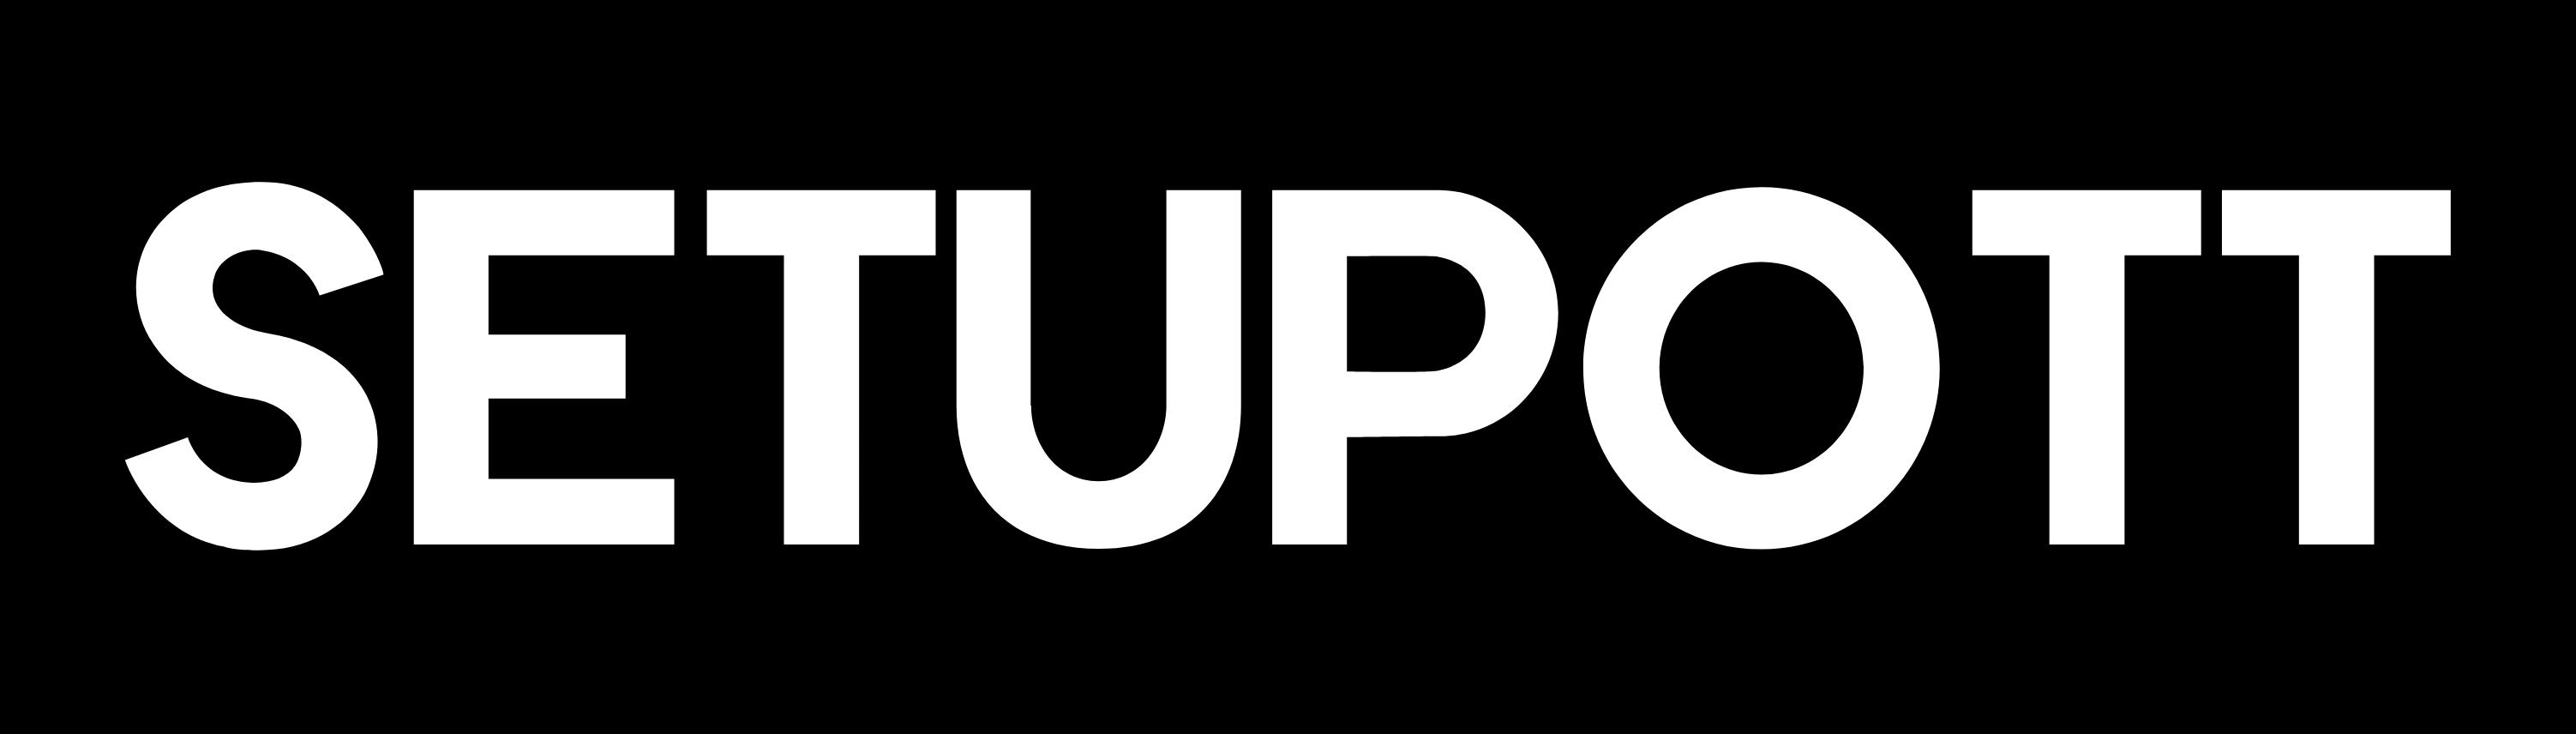 SetupOTT Blog